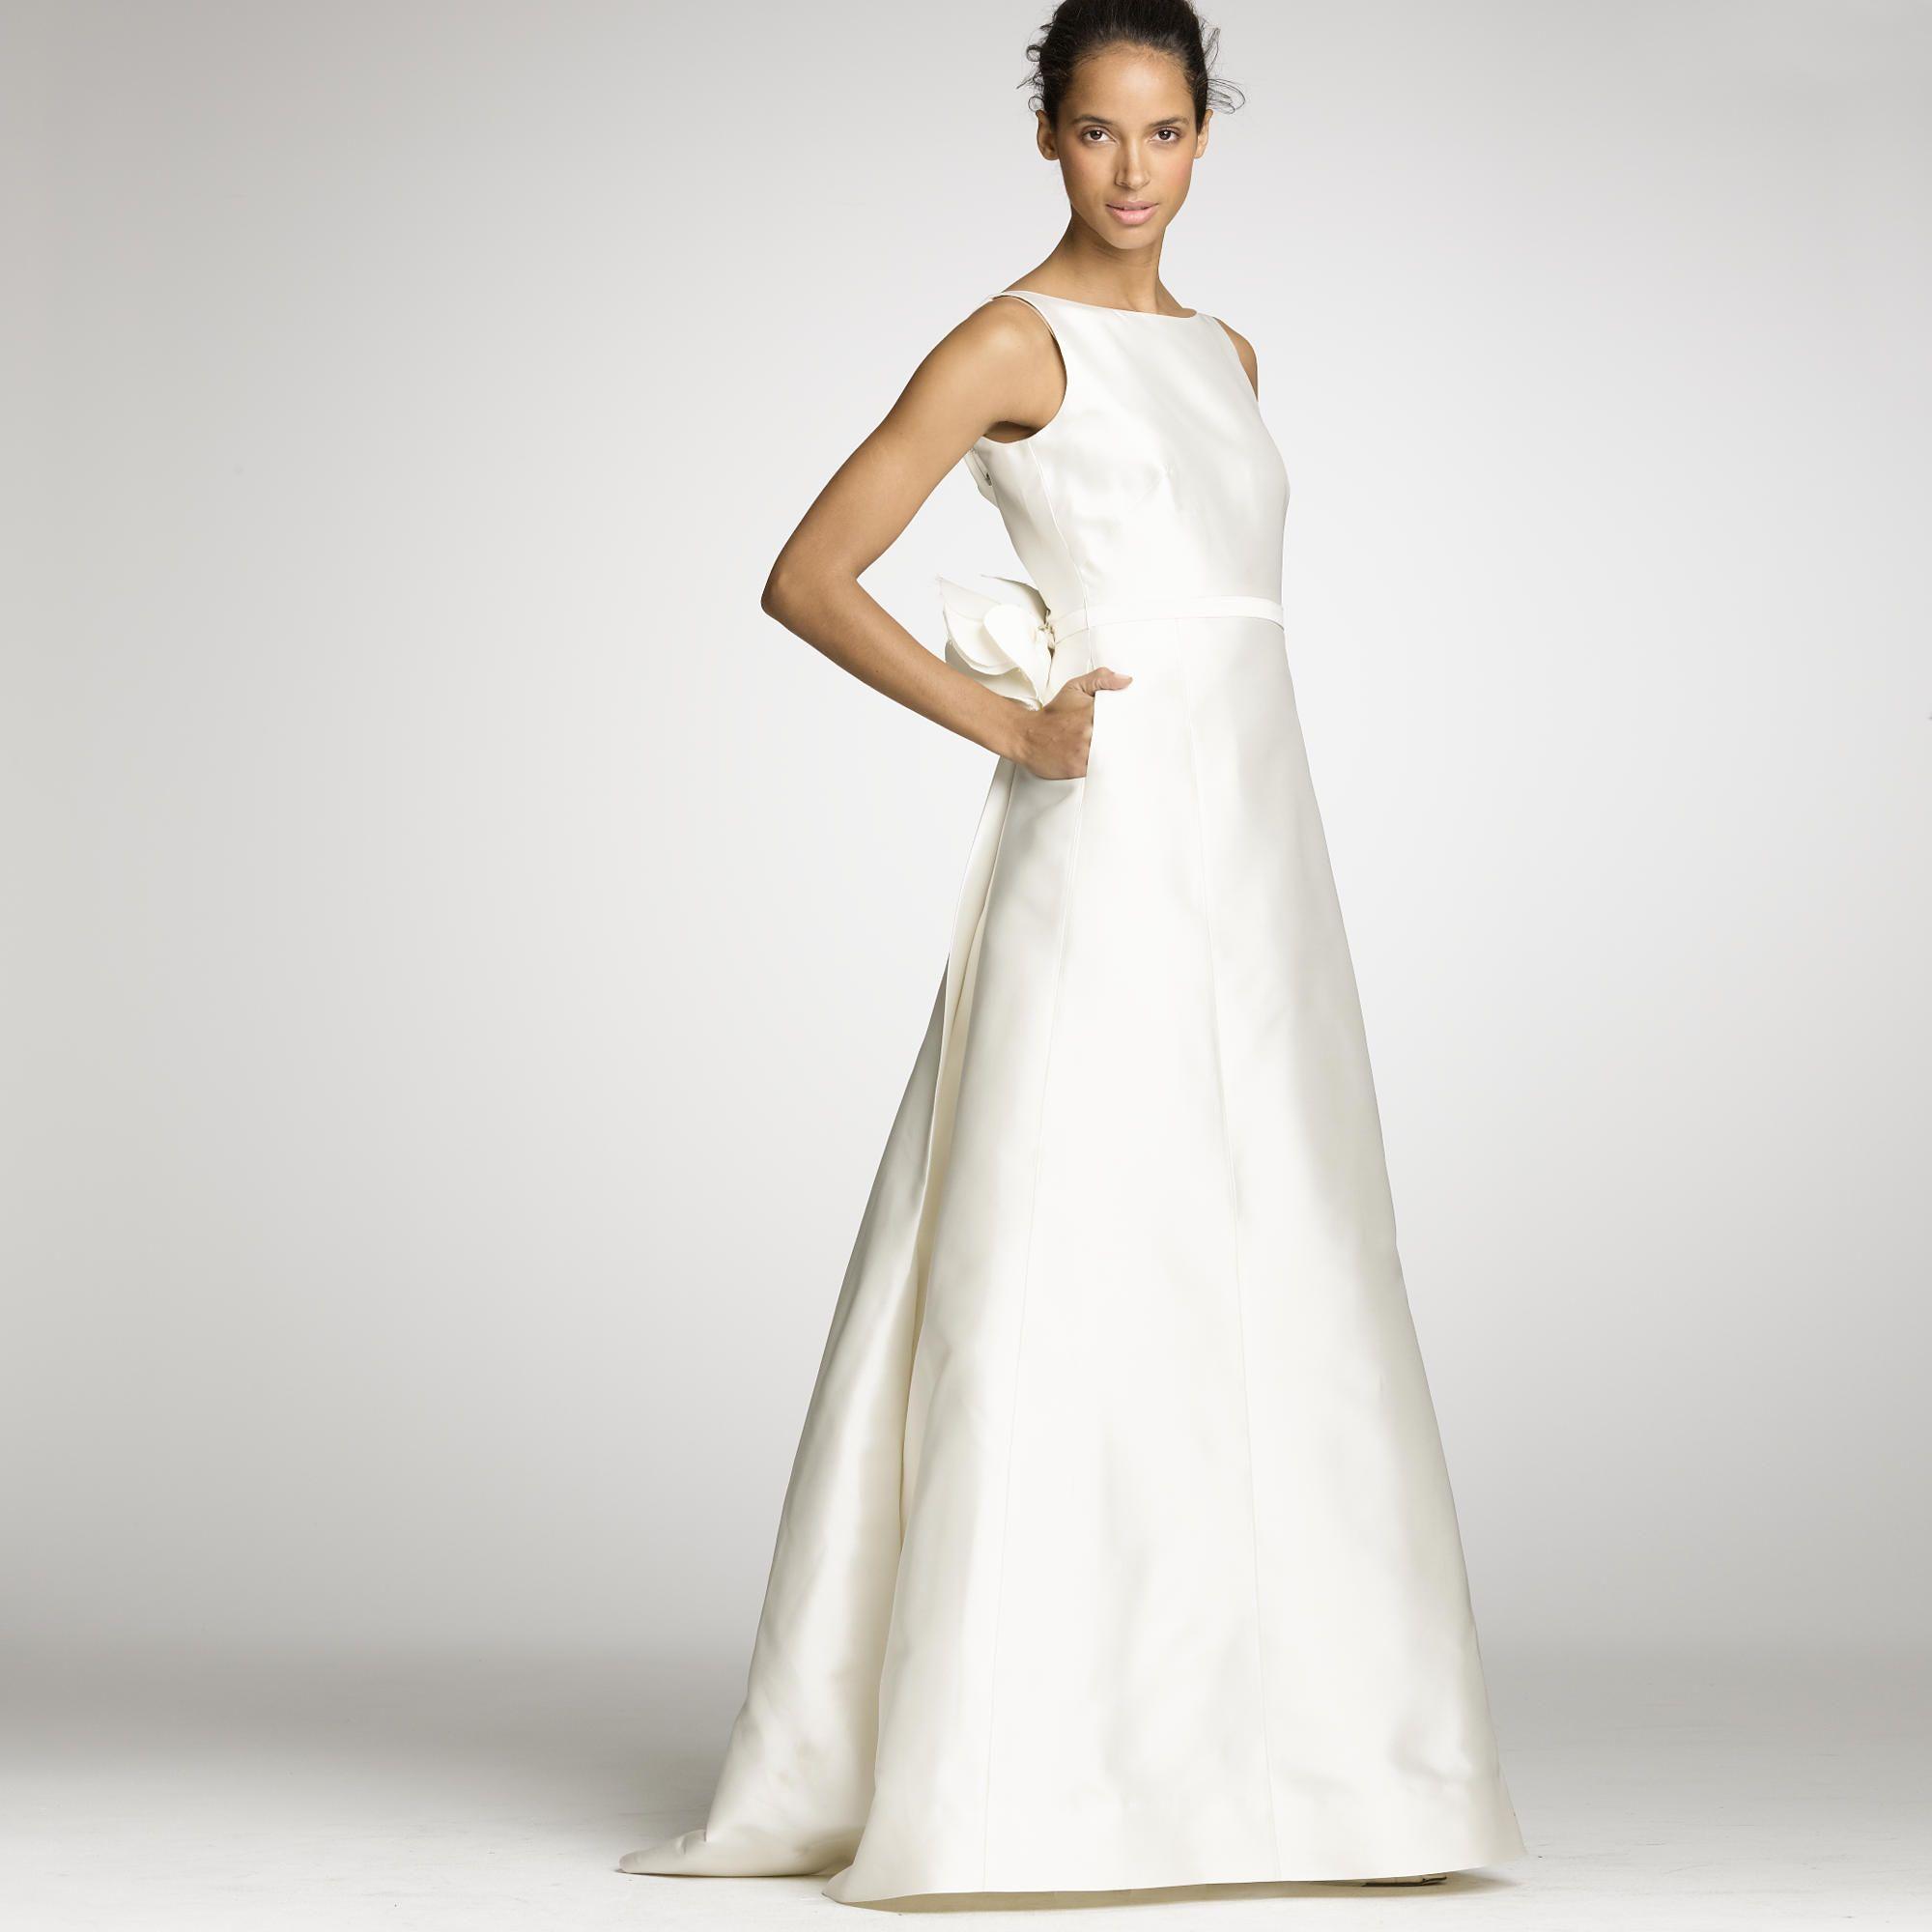 Silk gazar nanami gown for the bride jew the dress silk gazar nanami gown for the bride jew wedding dress salediy ombrellifo Choice Image